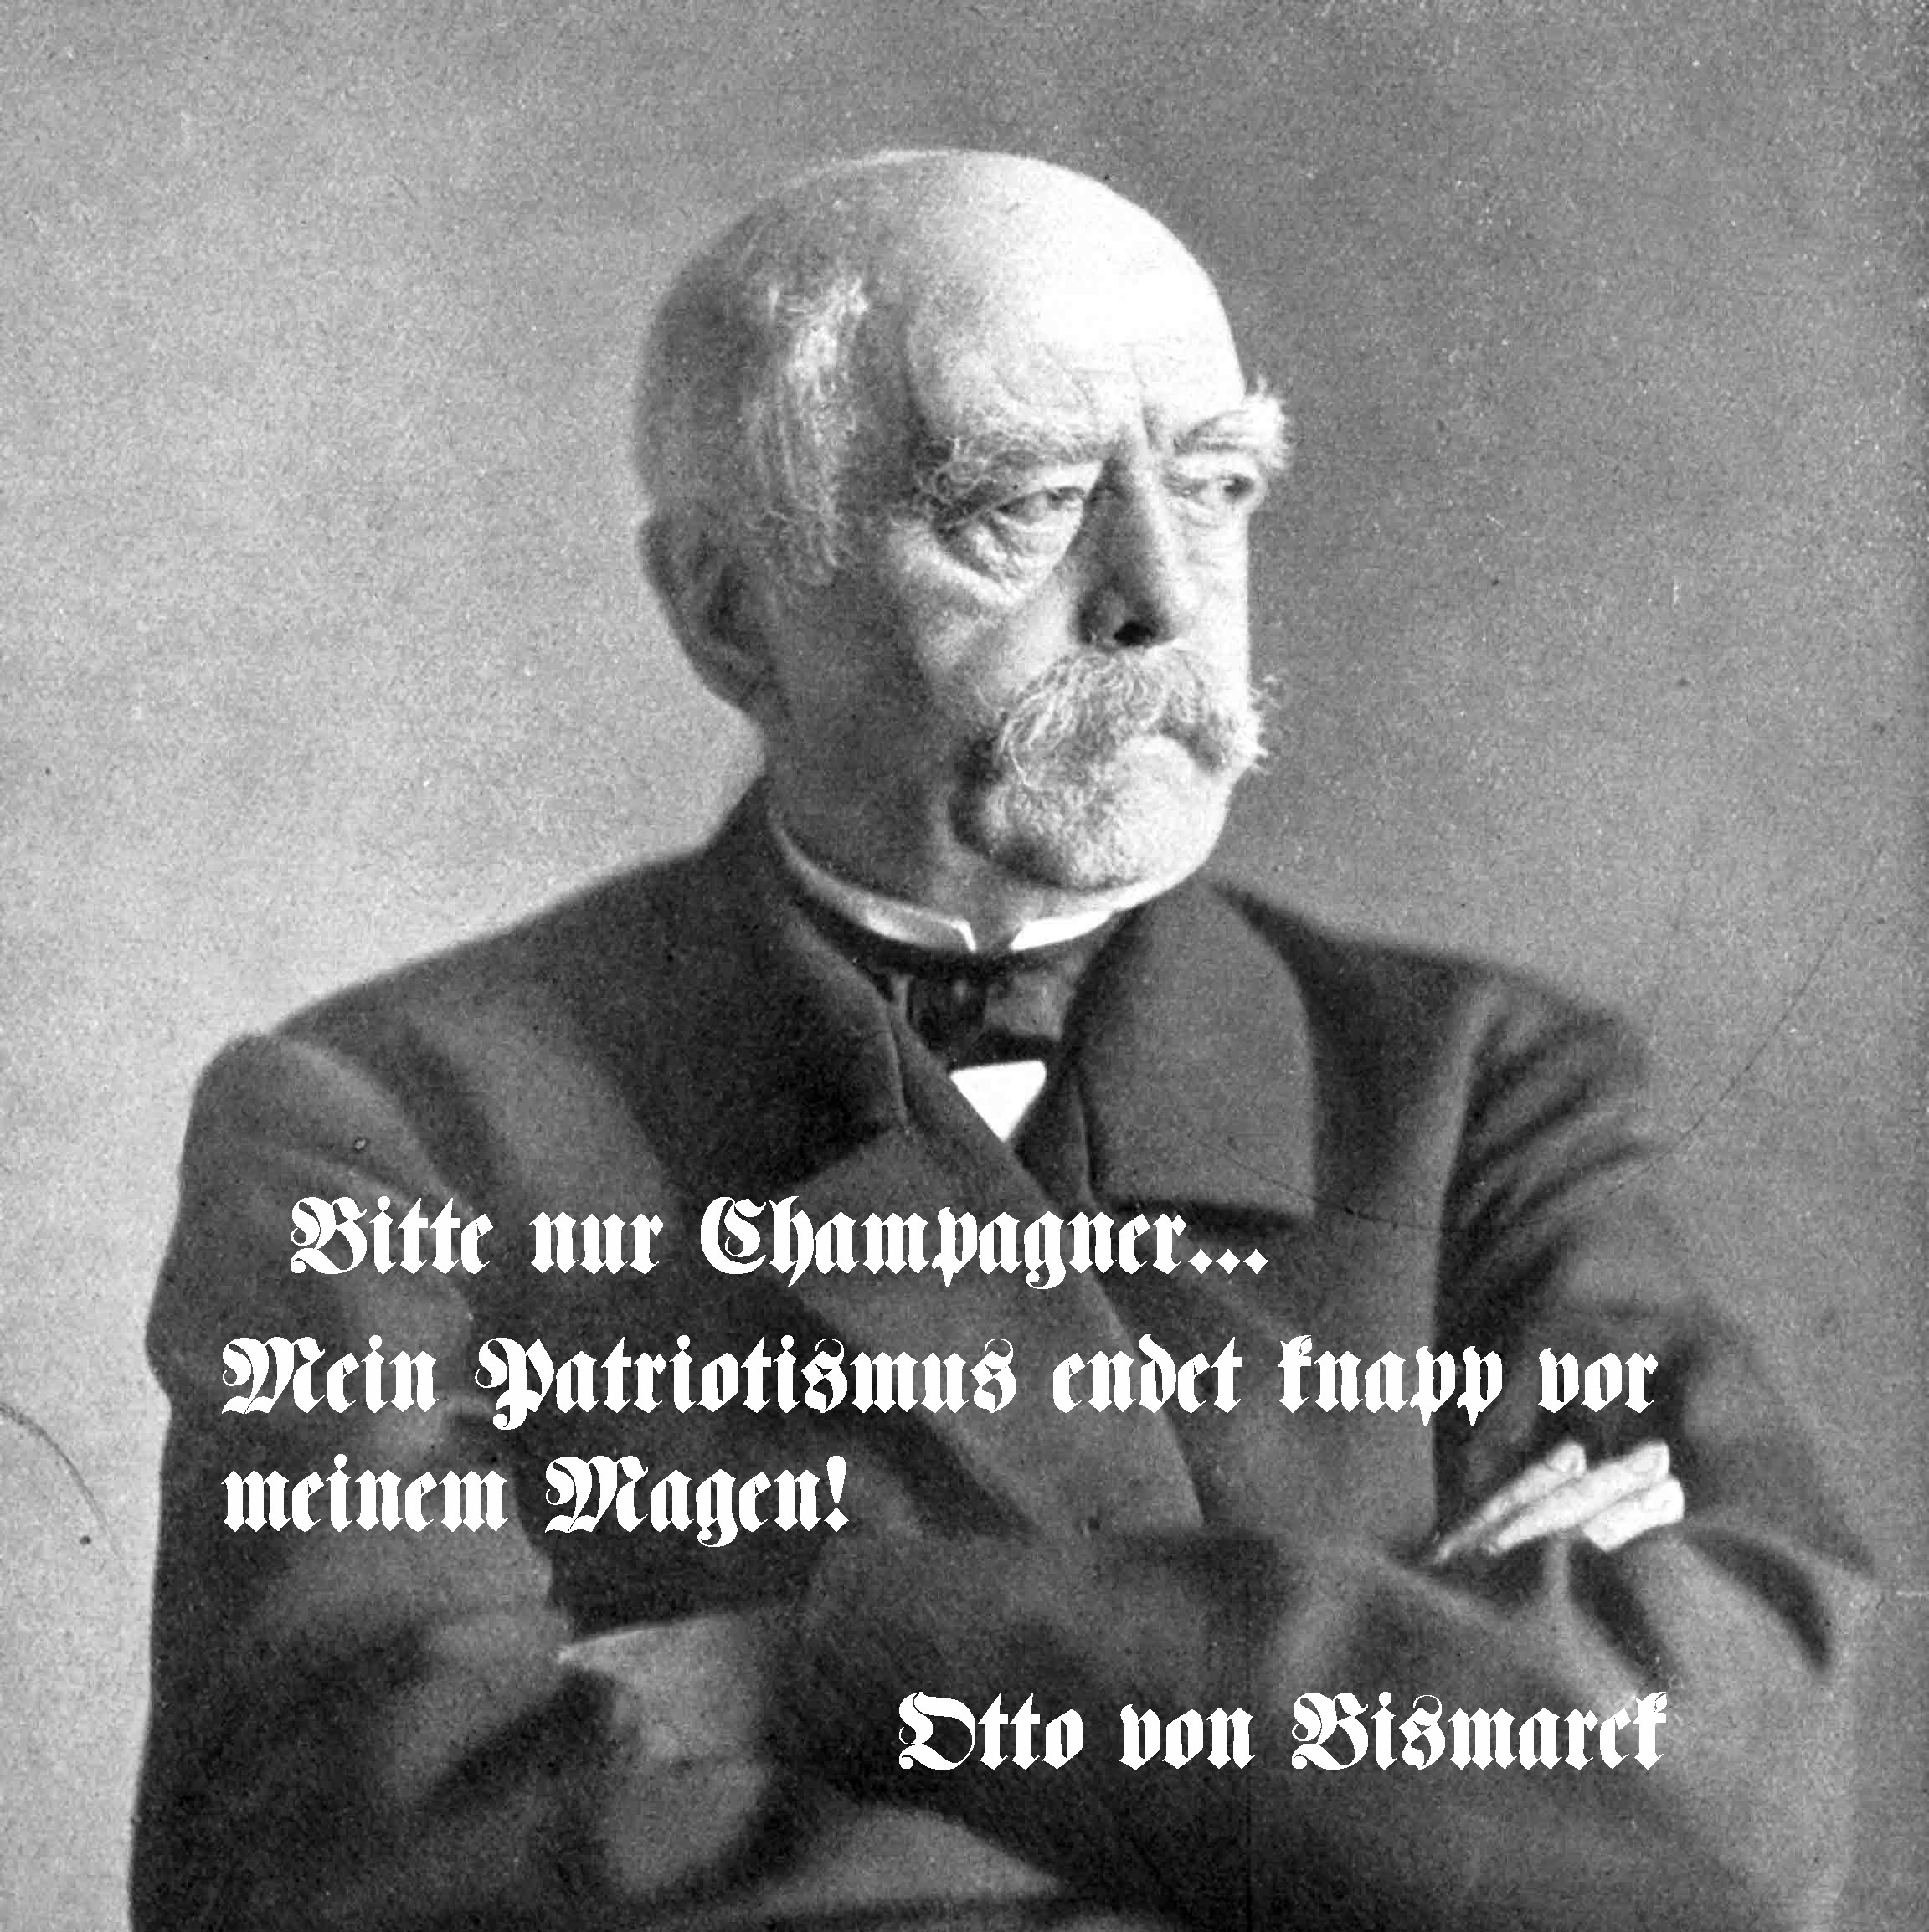 Bitte nur Champagner - Bismarck